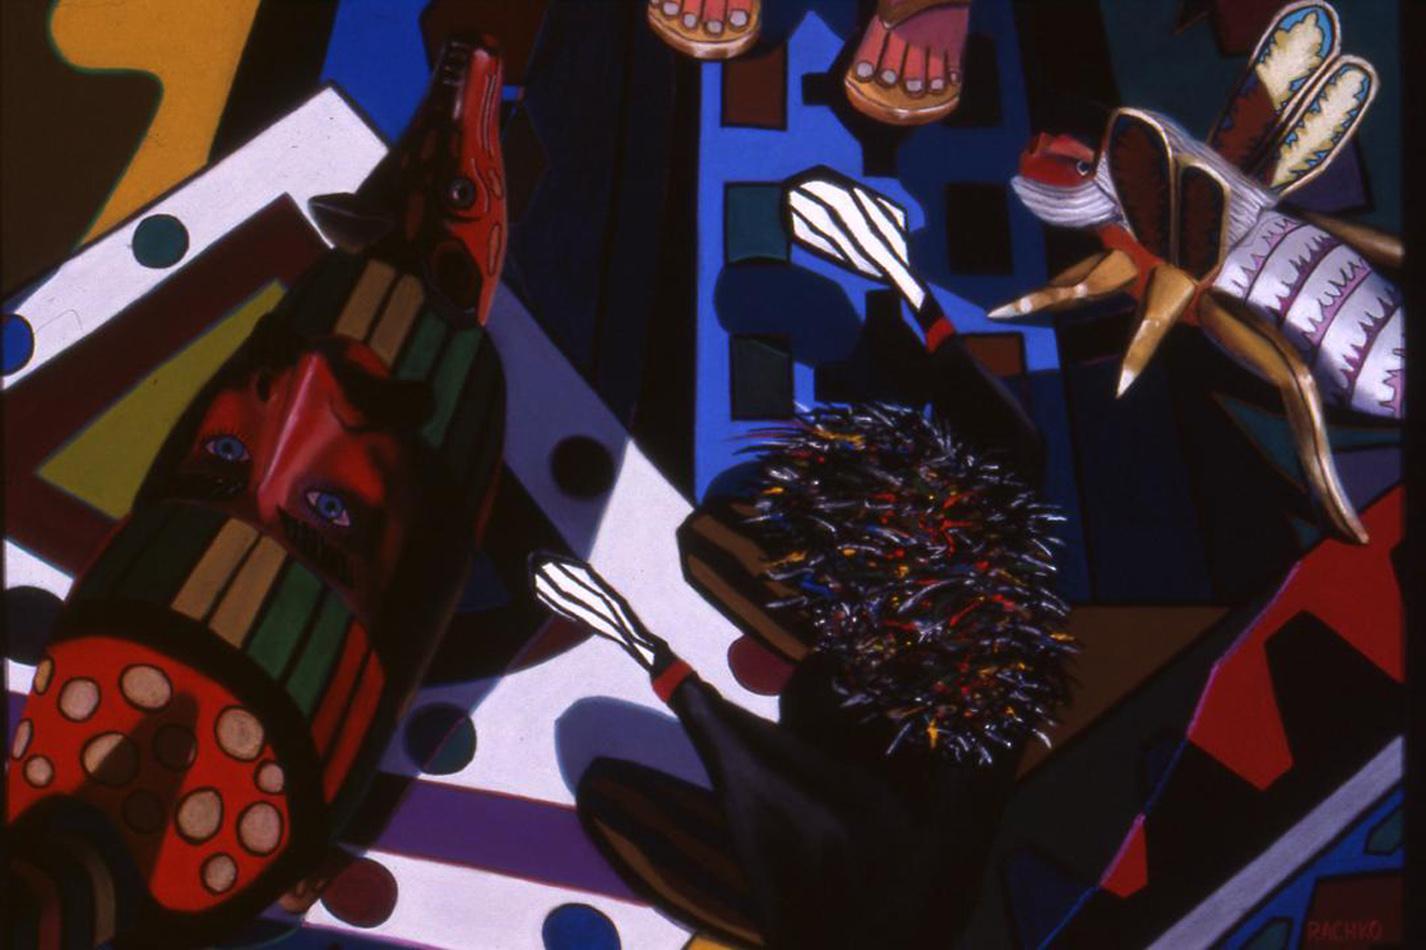 Scene Twentyone: Living Room bright colors, domestic, Latin objects